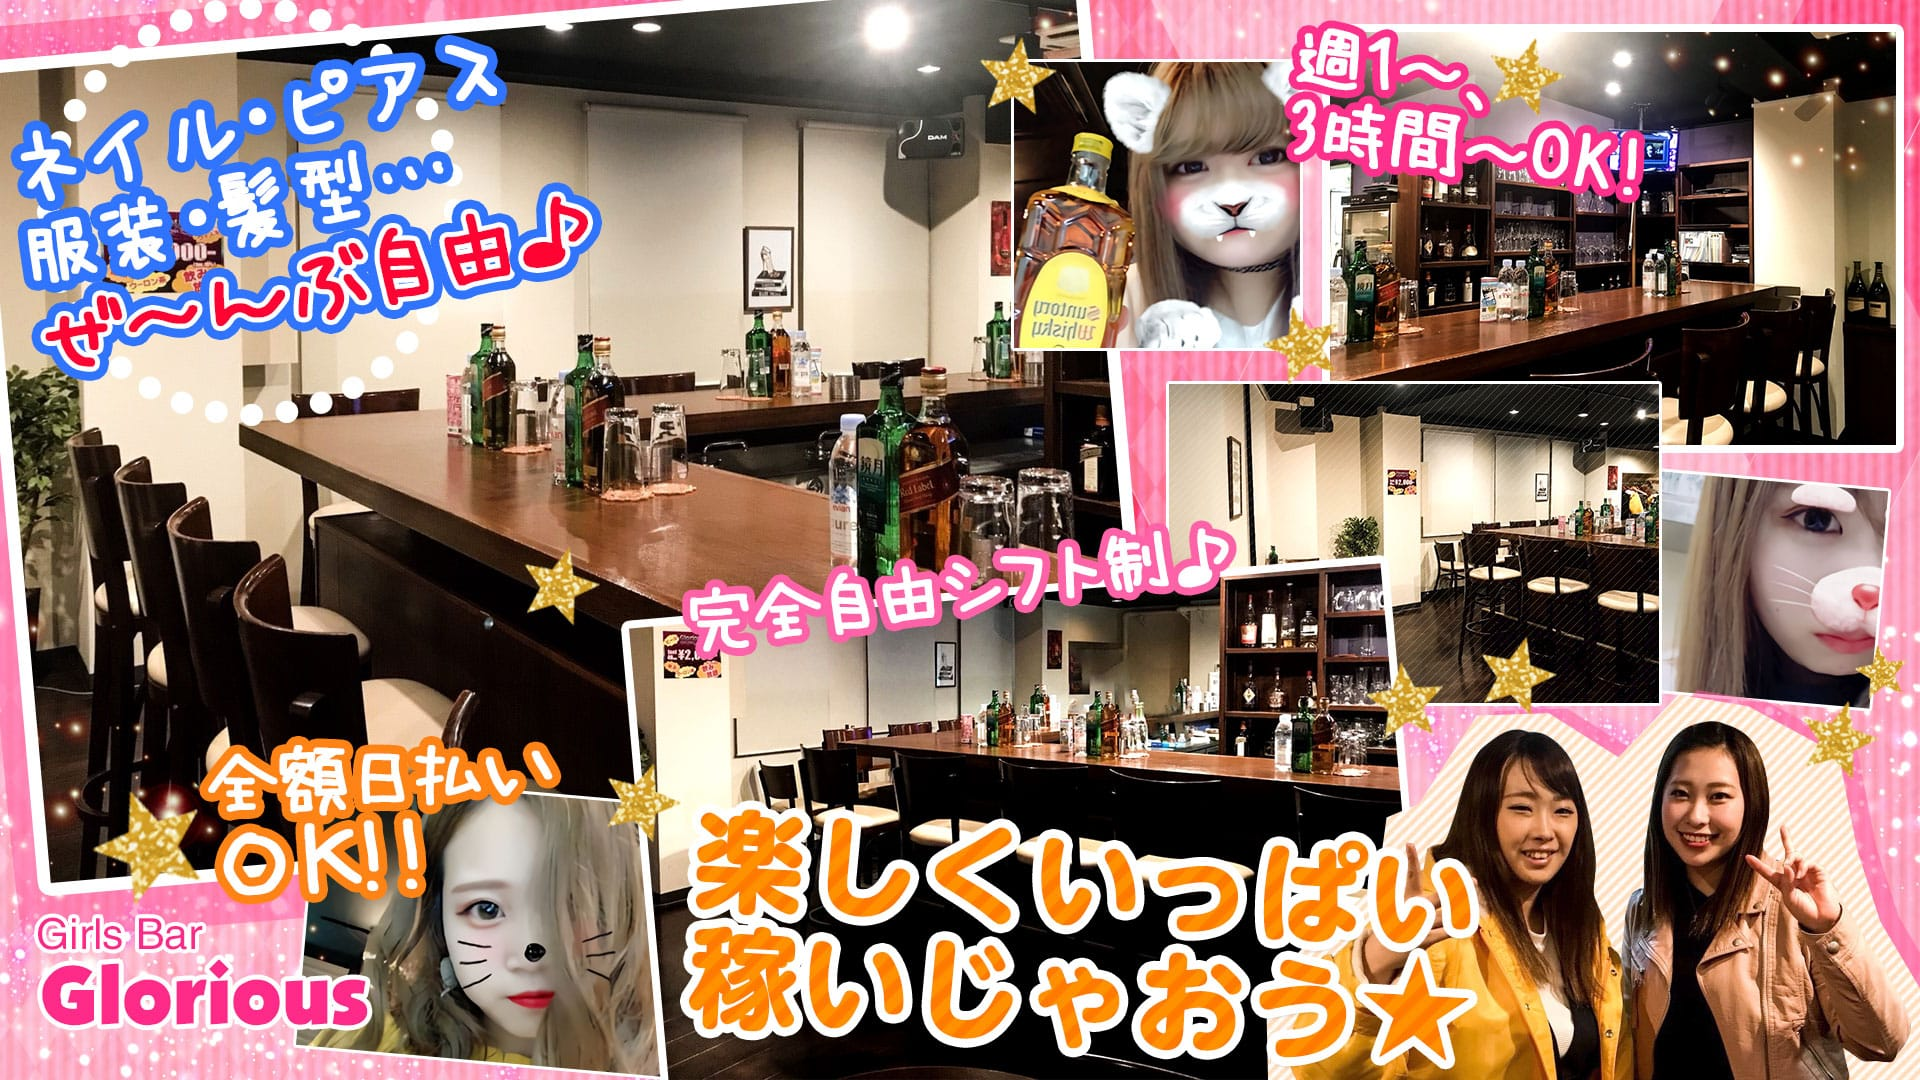 Girls Bar Glorious(グロリアス) TOP画像